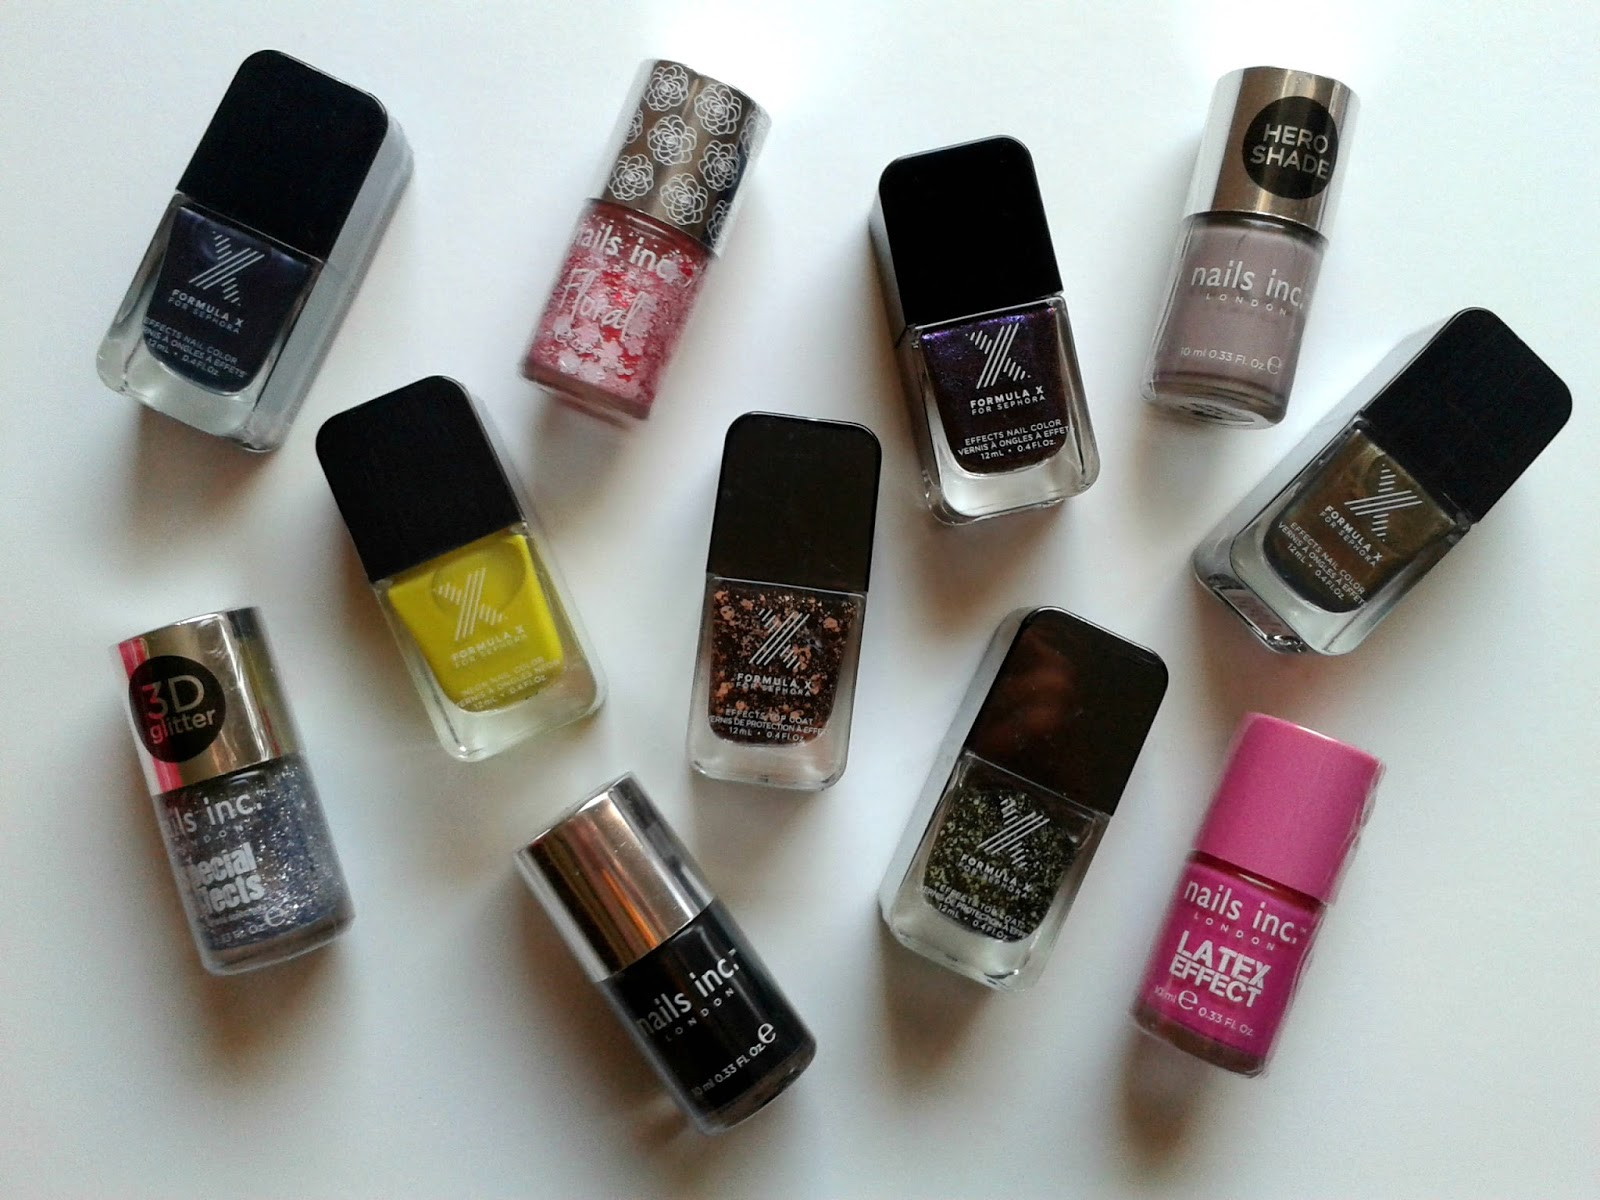 Sephora Sale Nail Polishes Nails Inc Formula X